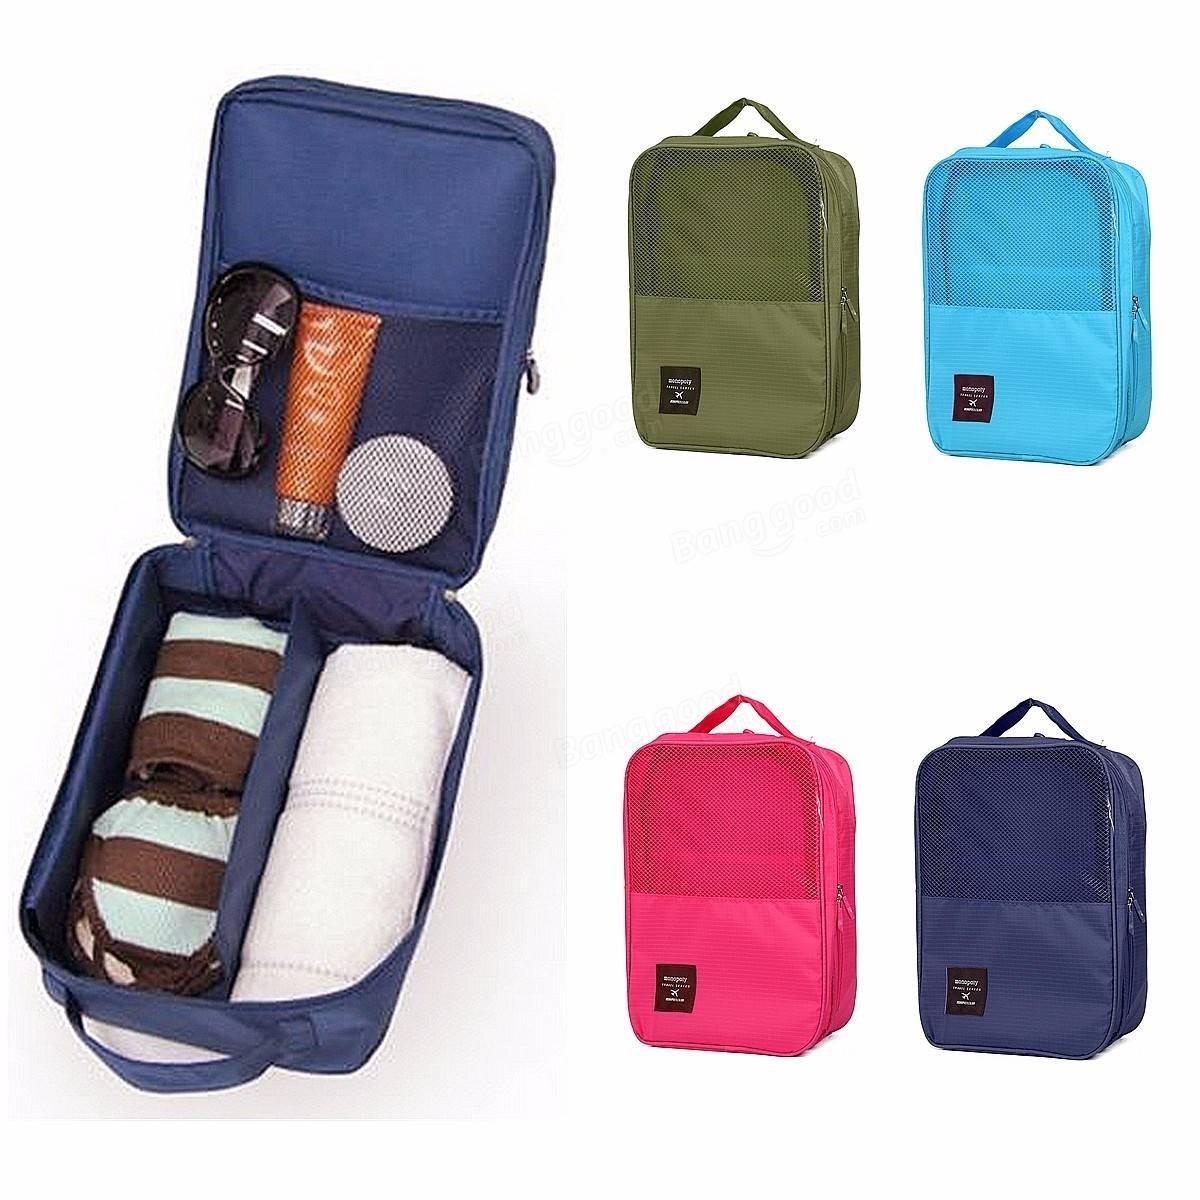 8f7a3cba94c1 Big Bazaar Bazaar Travel Storage Bags Waterproof Portable Shoes Box ...